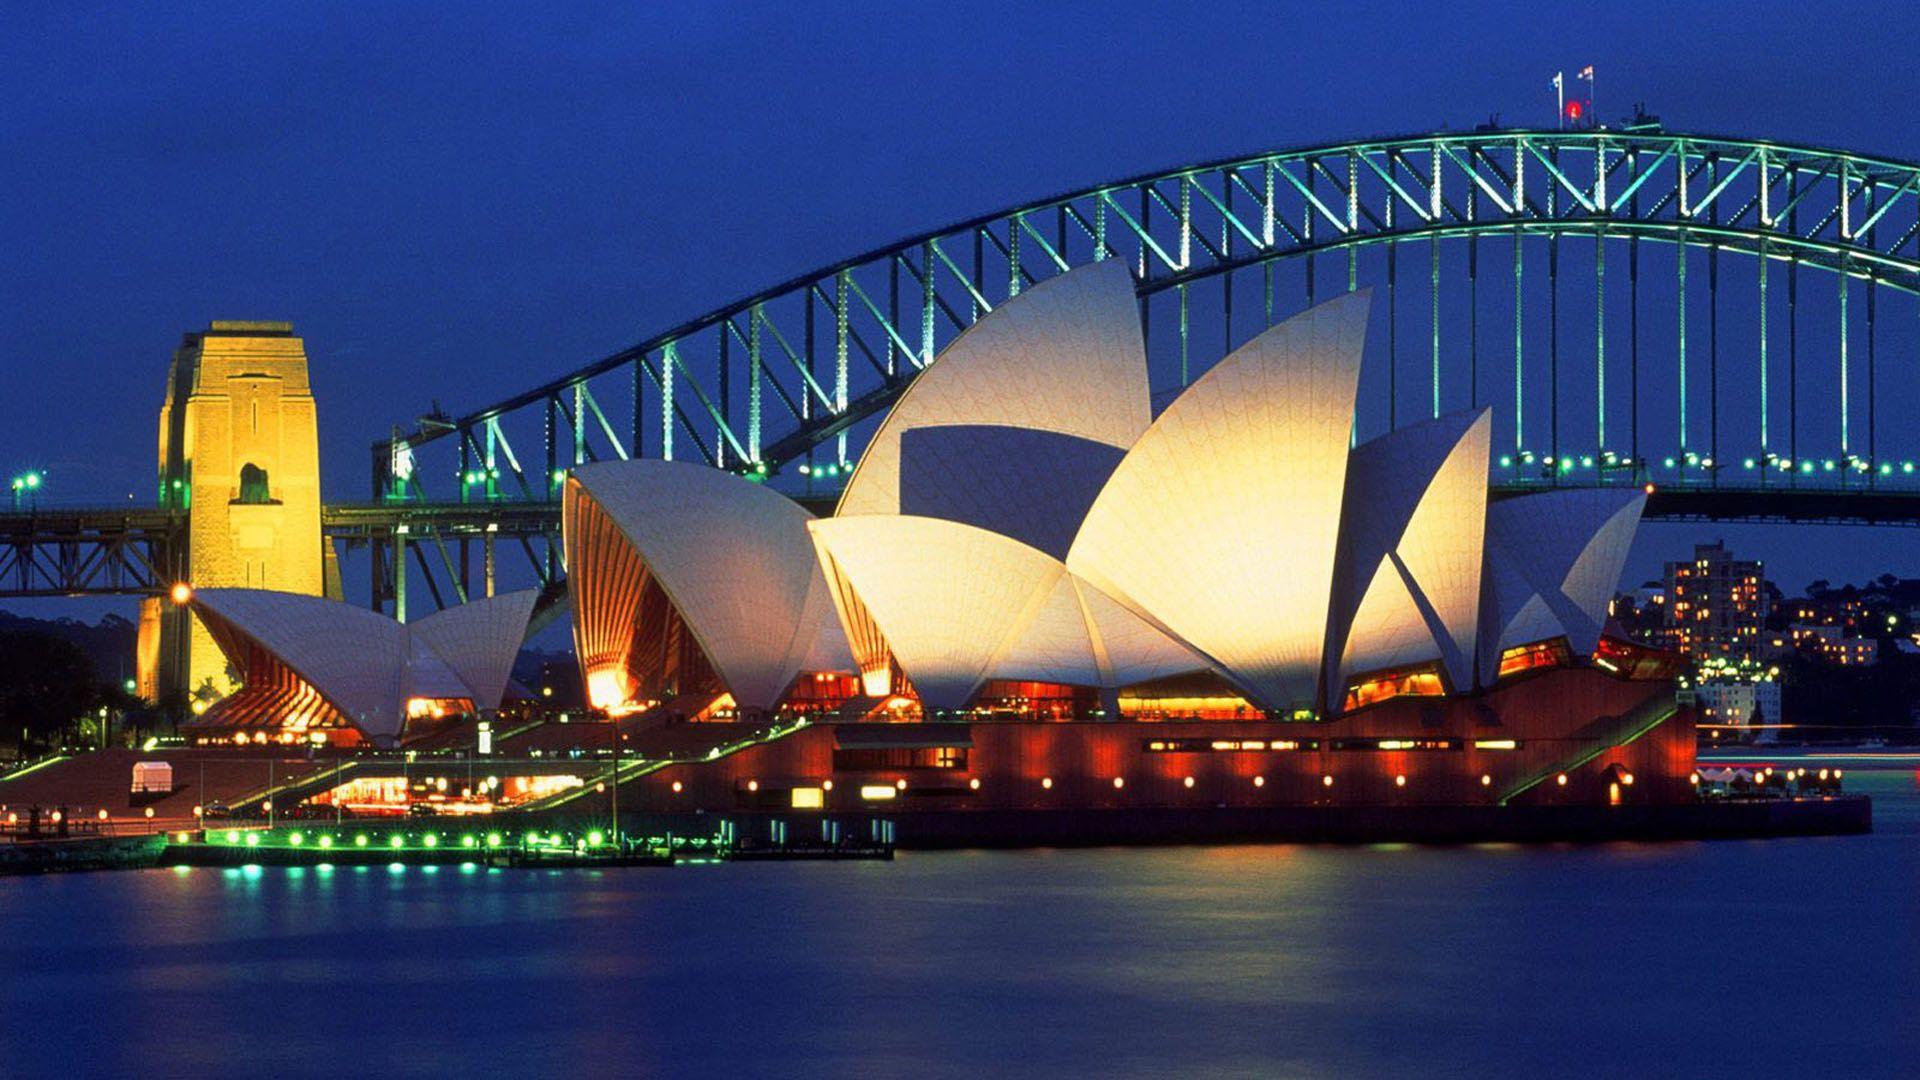 Sydney Opera House Australia 1080p Hd Wallpaper Australia Travel Australia Pictures Places To See